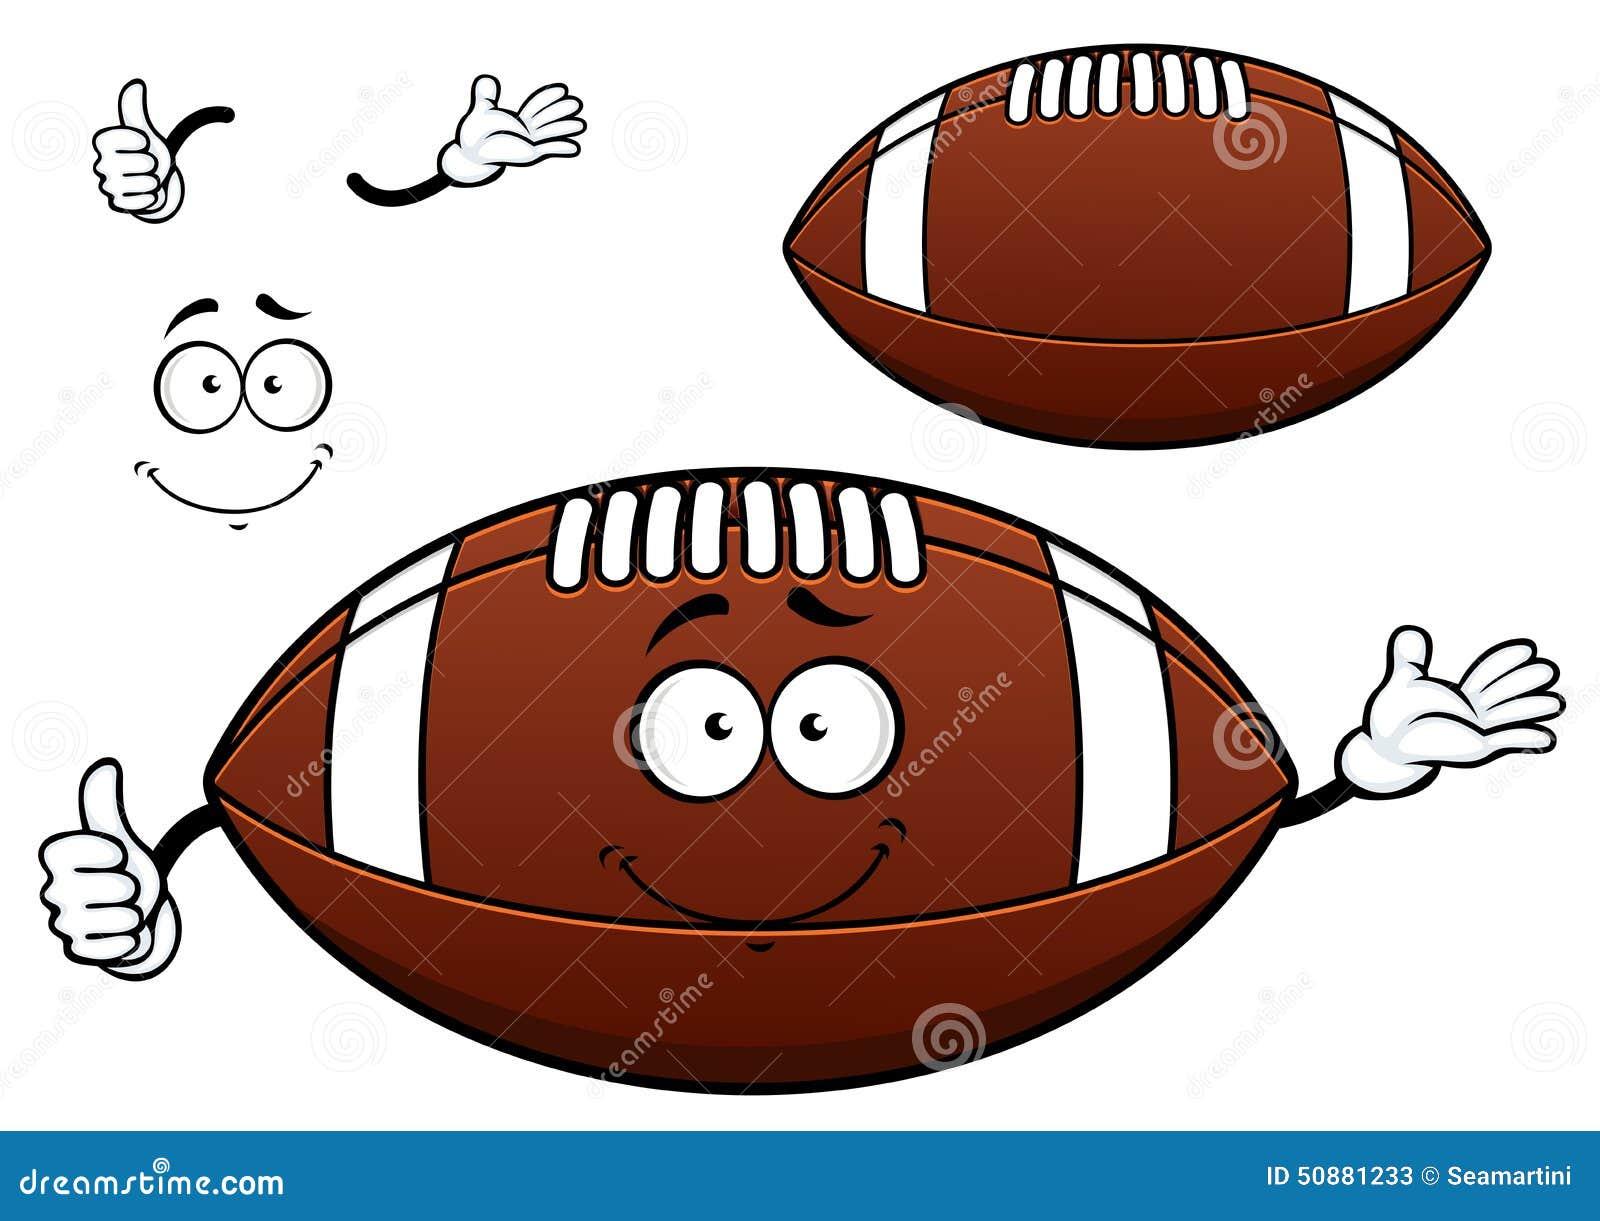 Personnage de dessin anim de boule de football am ricain - Dessin football americain ...